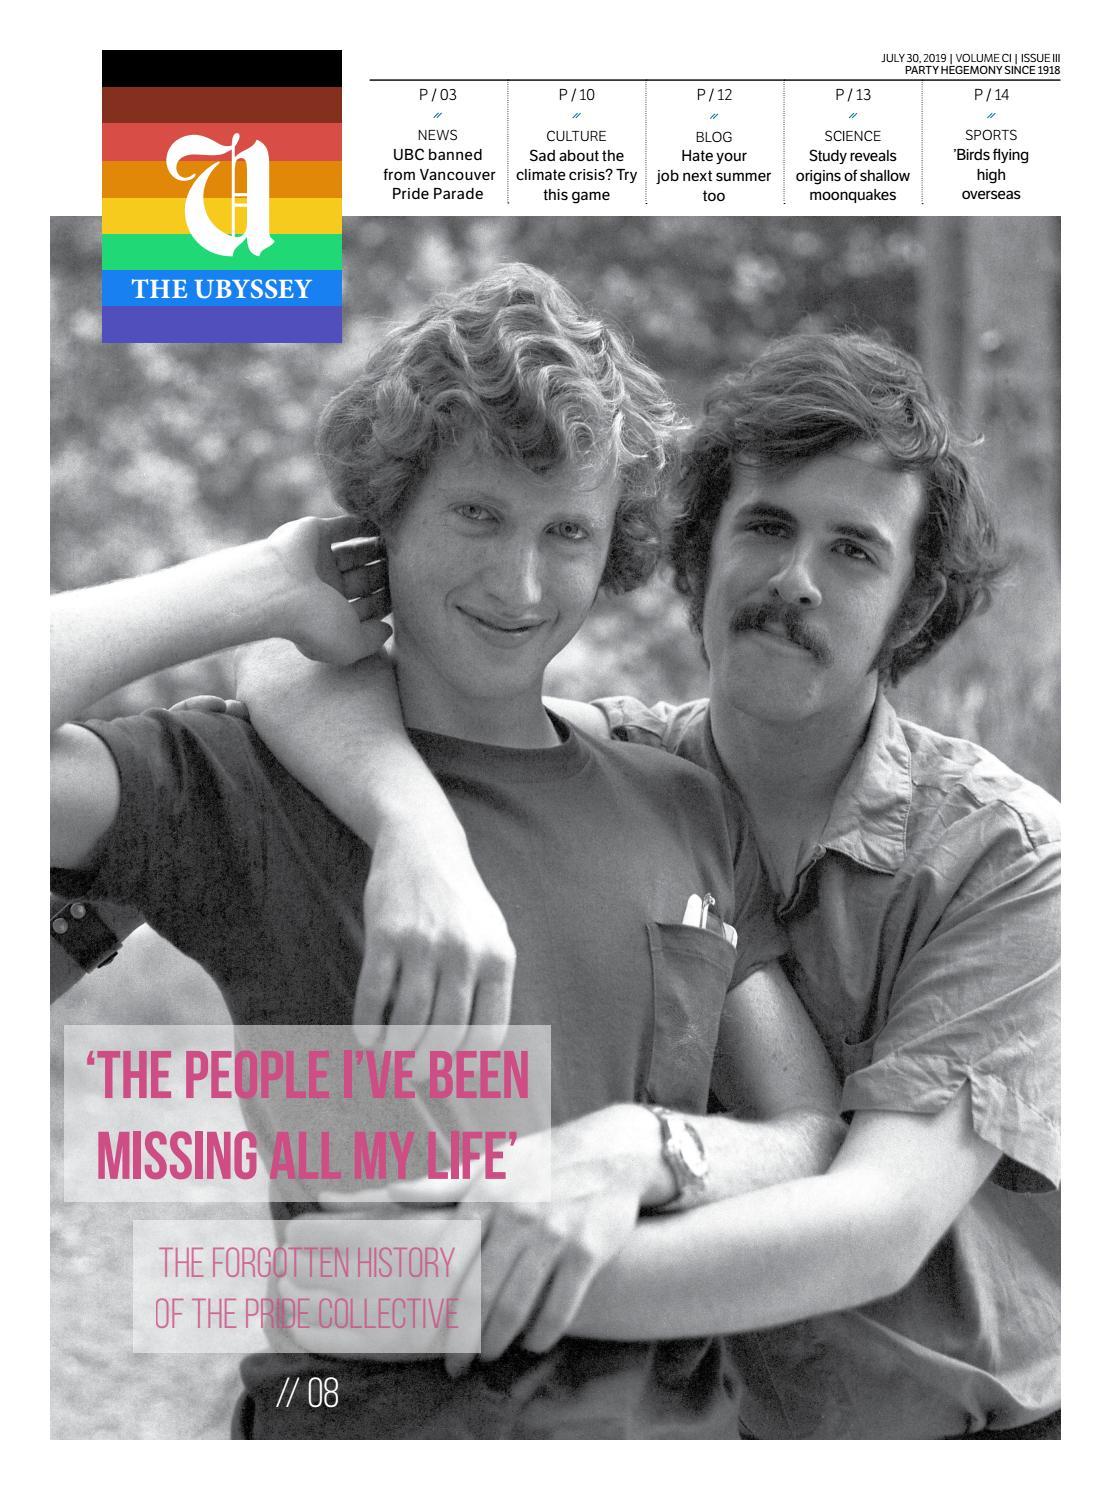 UBC gay dating